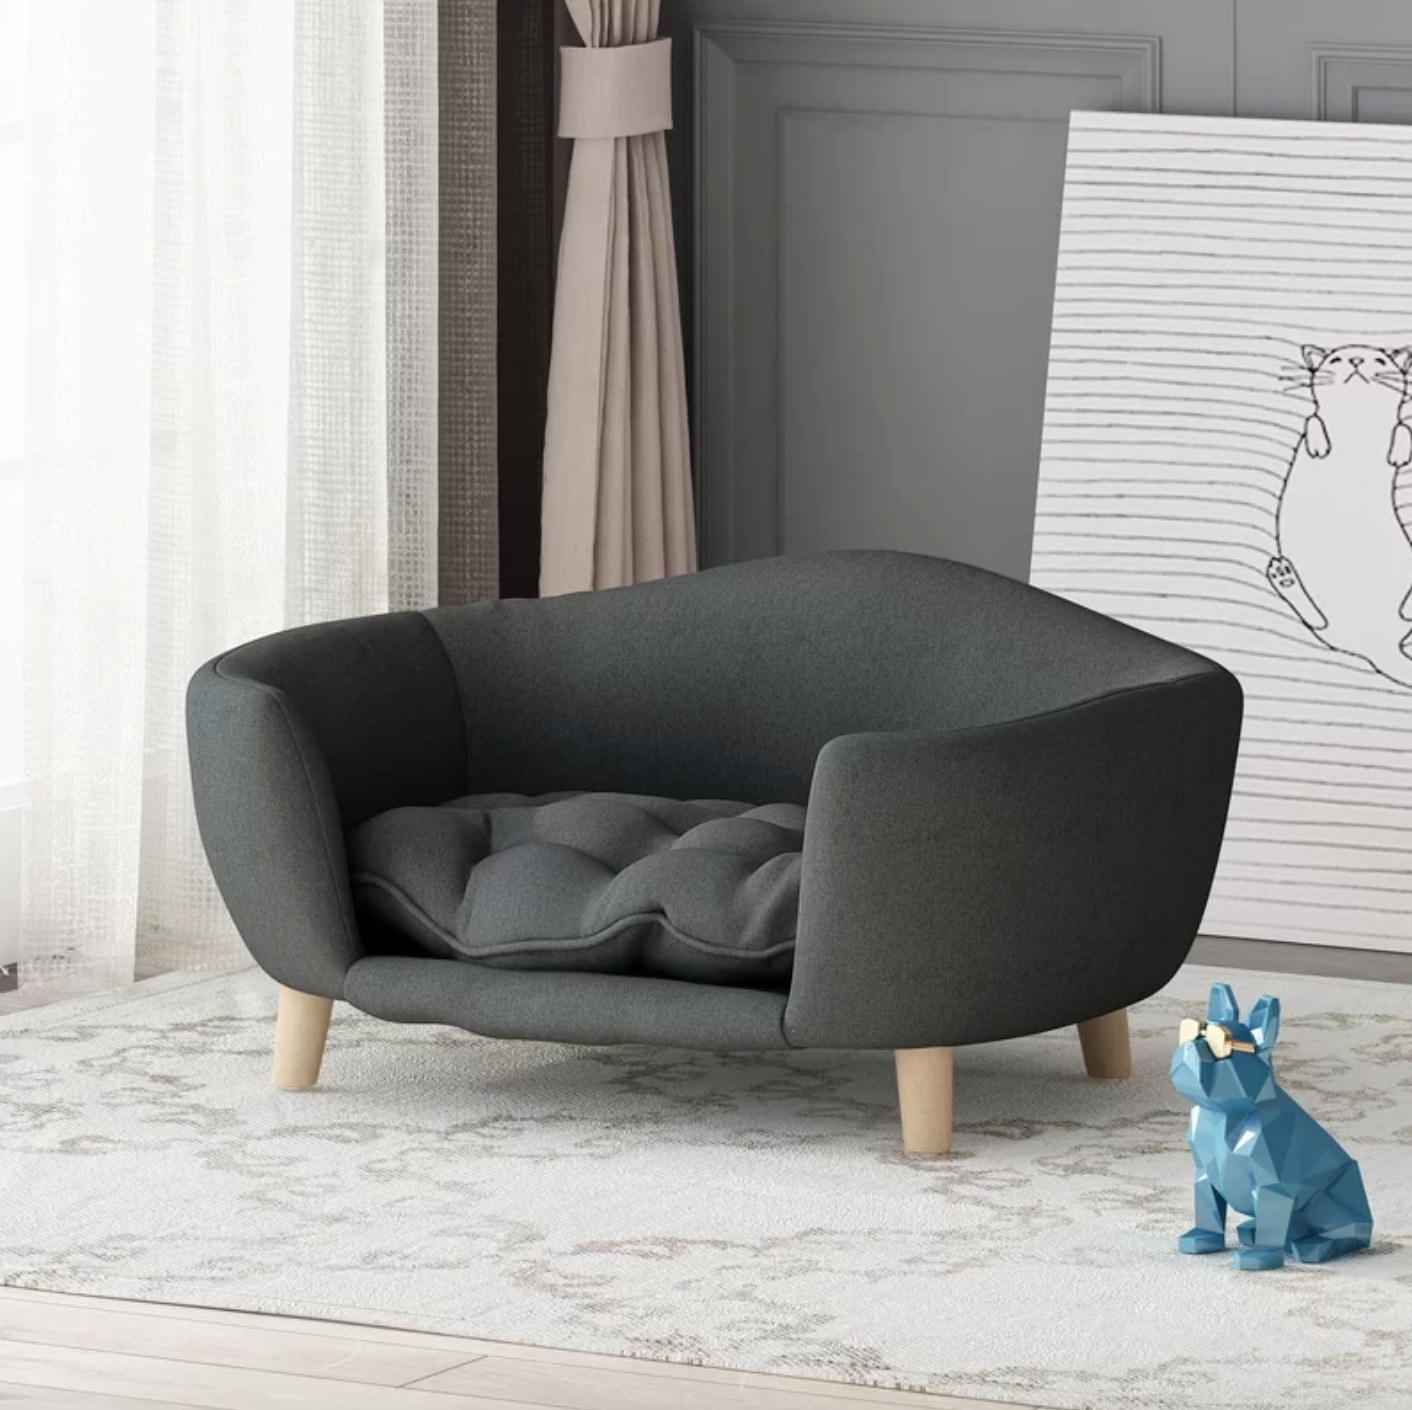 The mid century plush dog sofa in dark gray